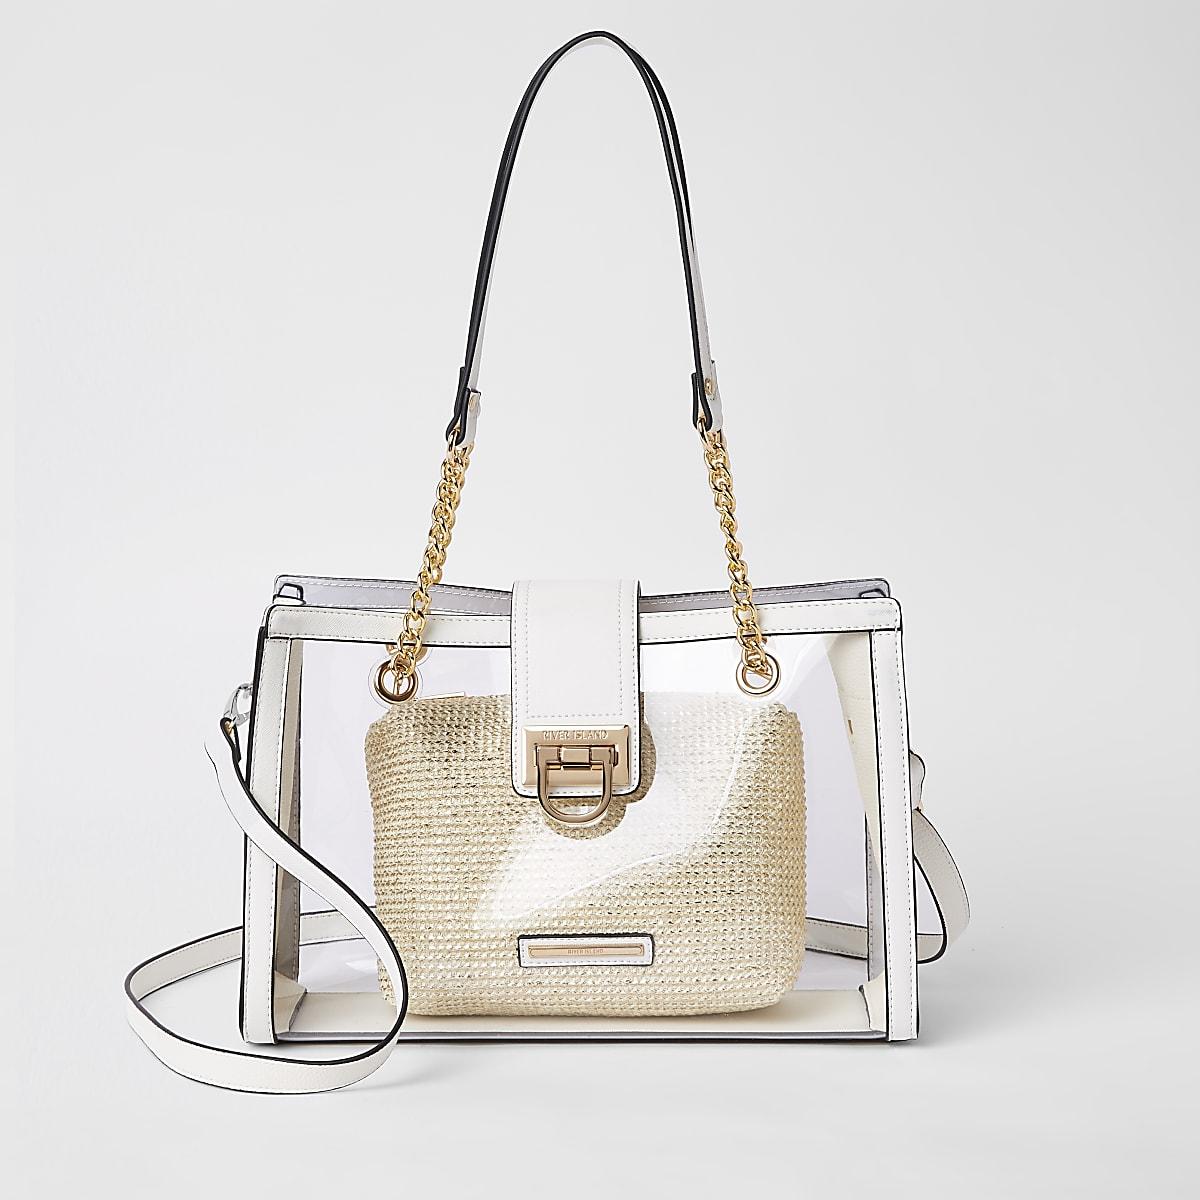 White Perspex tote bag